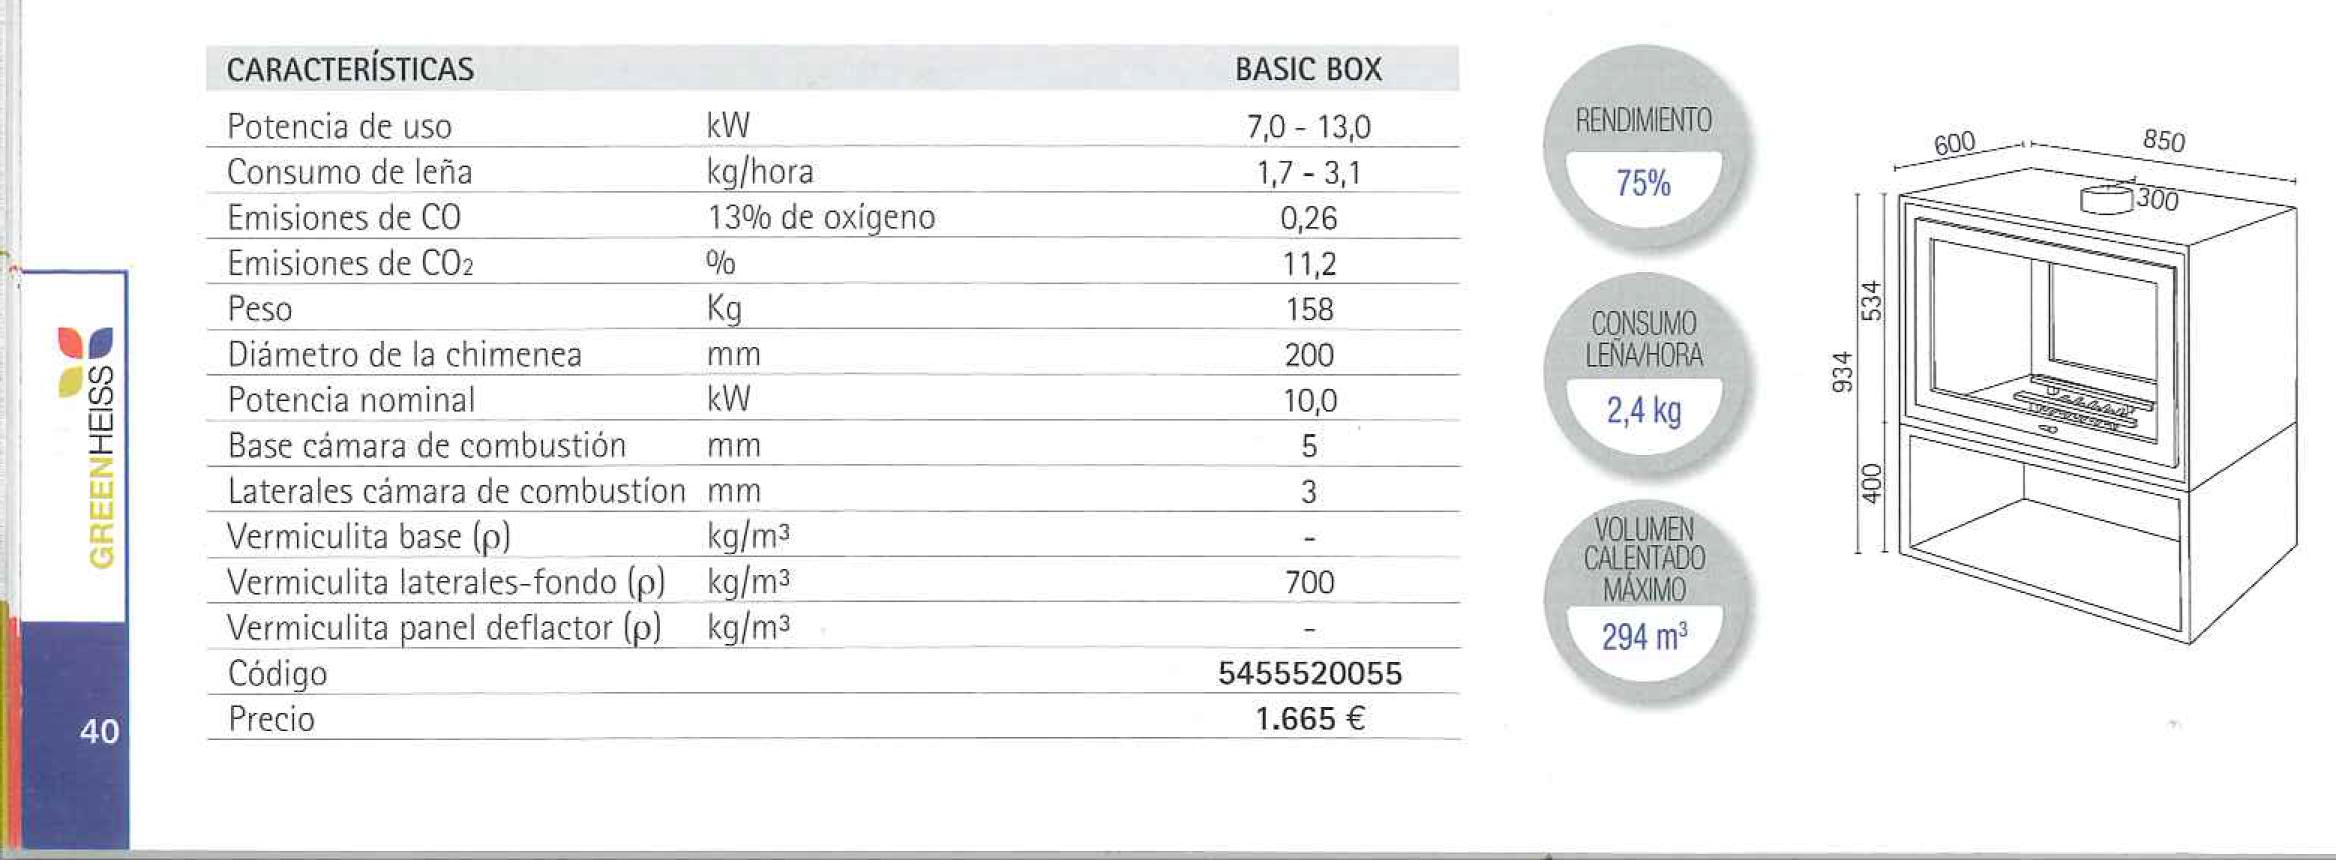 ficha_tecnica_basic_box.jpg